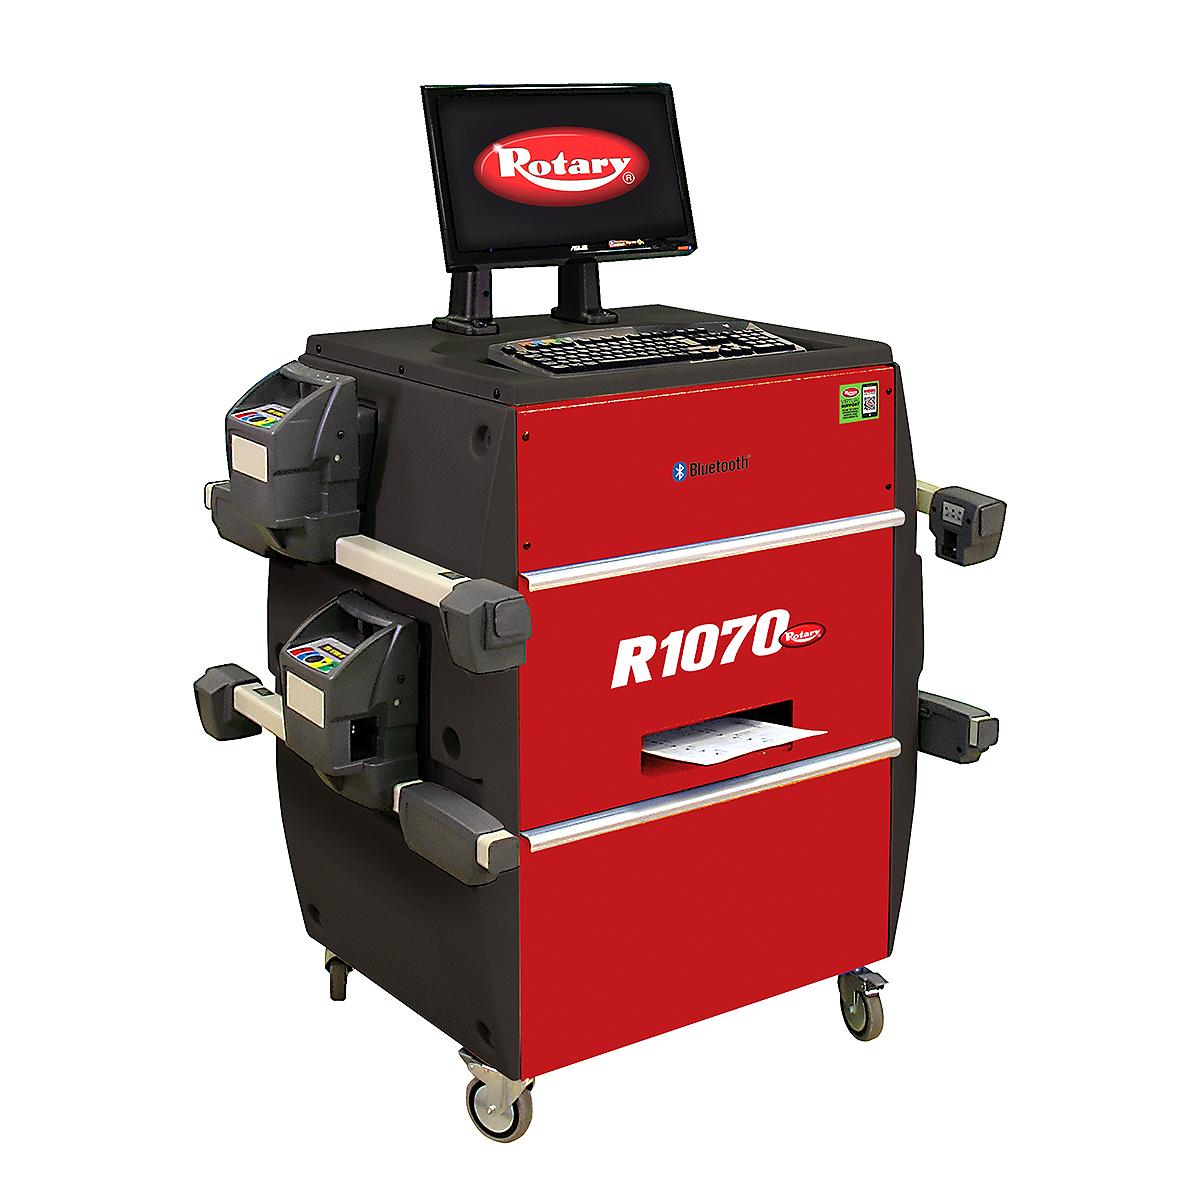 R1070_Wheel Balancer